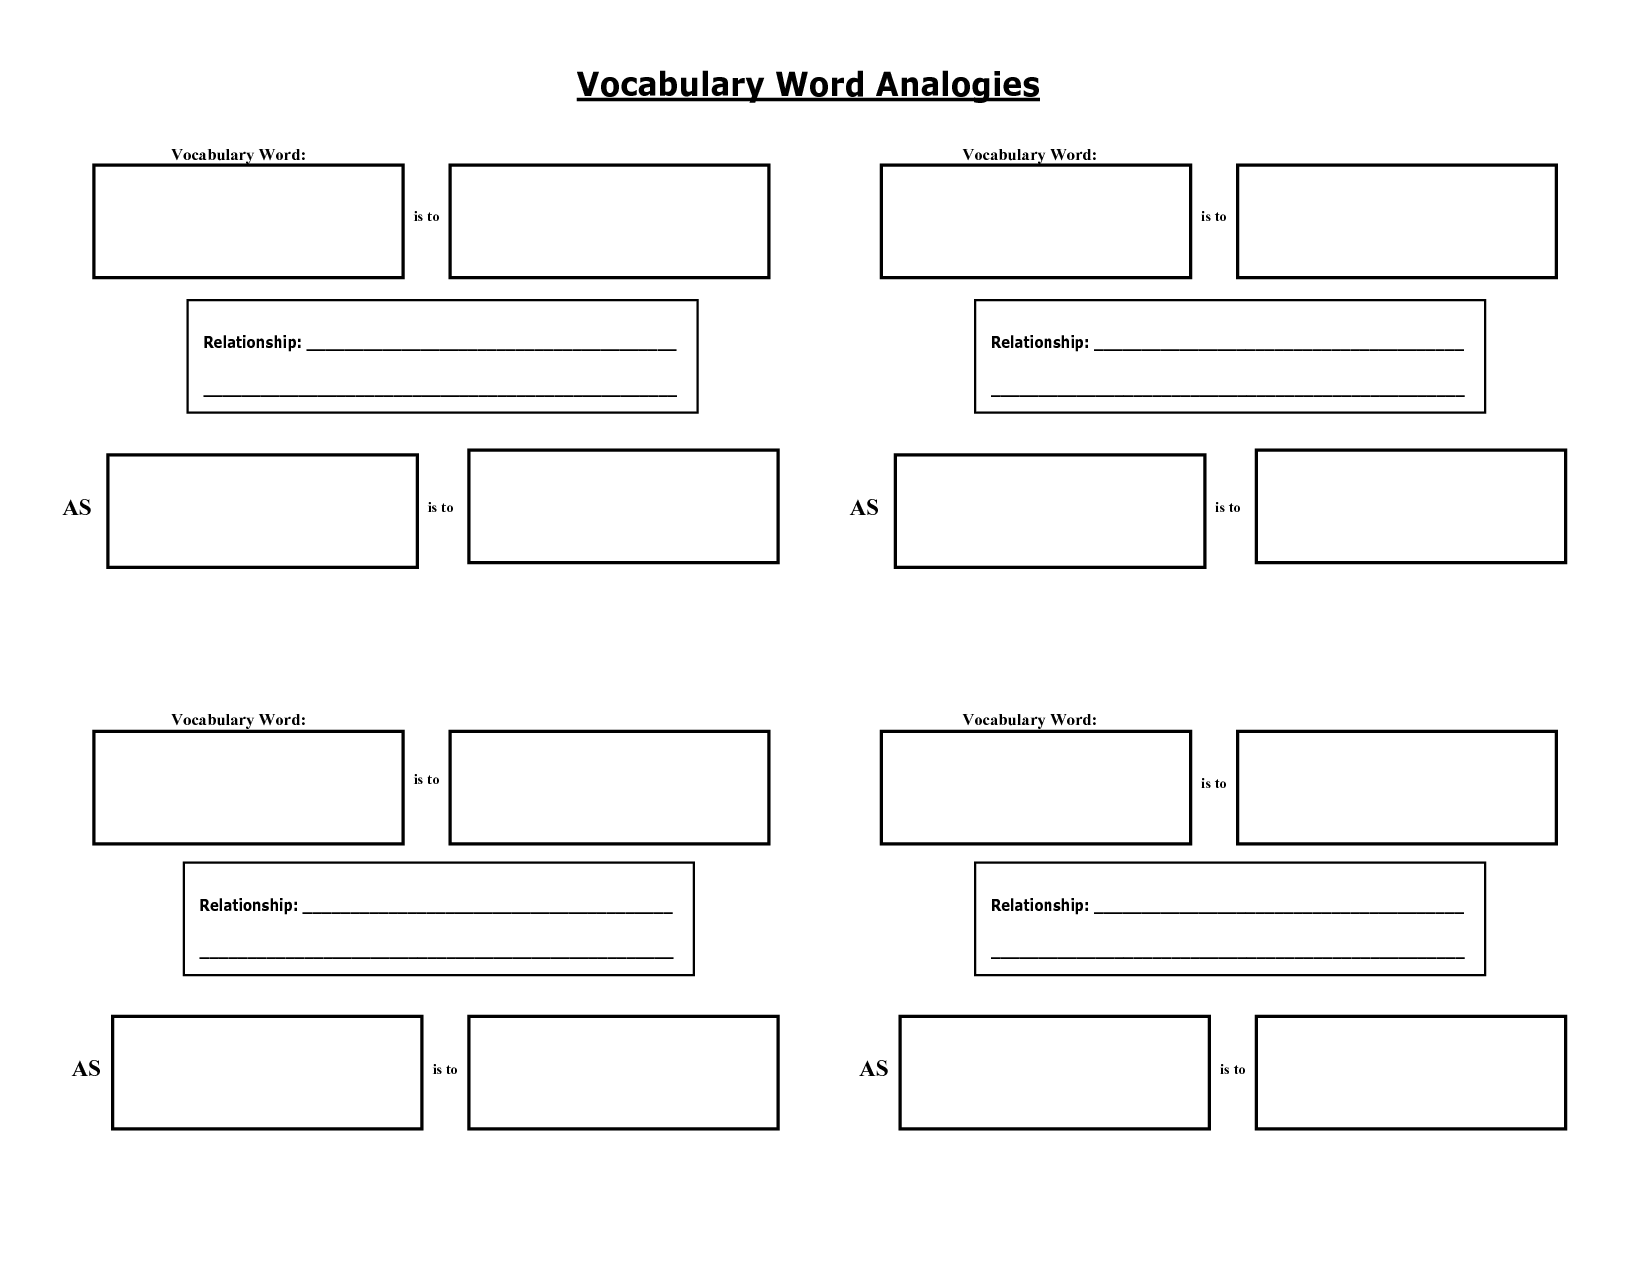 blank tree diagram graphic organizer 3 phase transformer wiring oil vocabulary word work pinterest